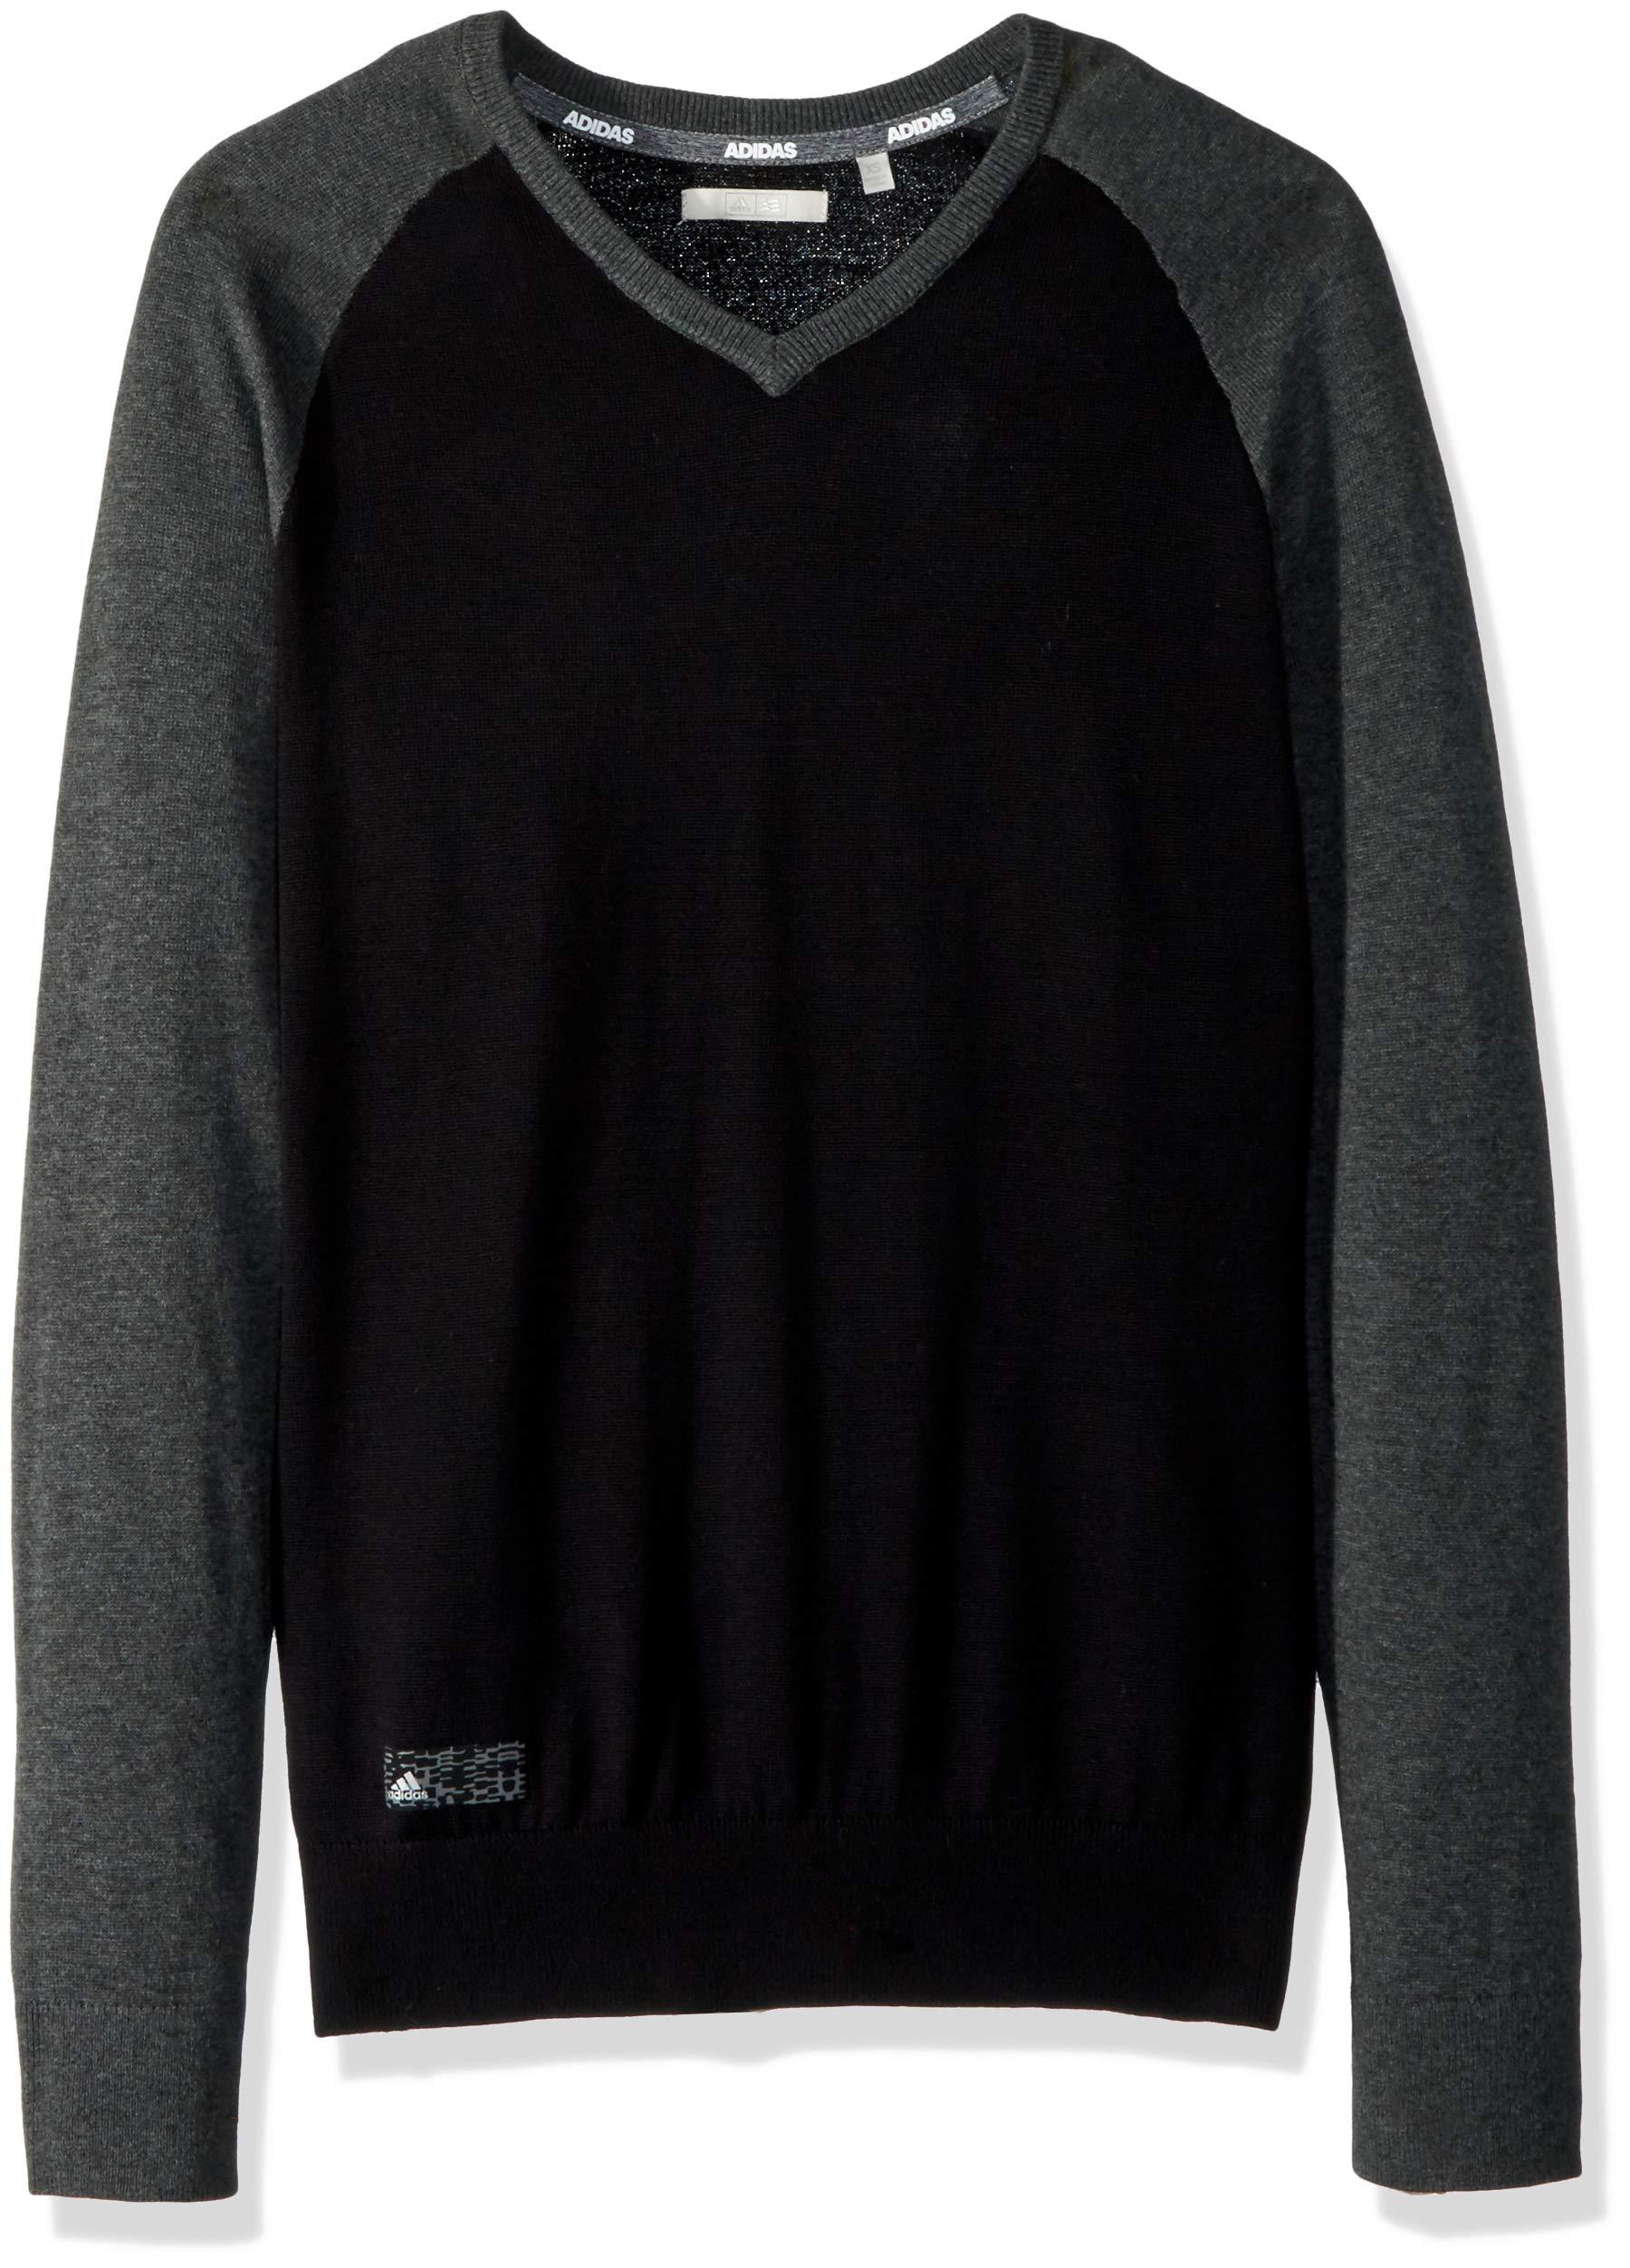 adidas Golf Essentials Sweater, Black HTR, X-Small